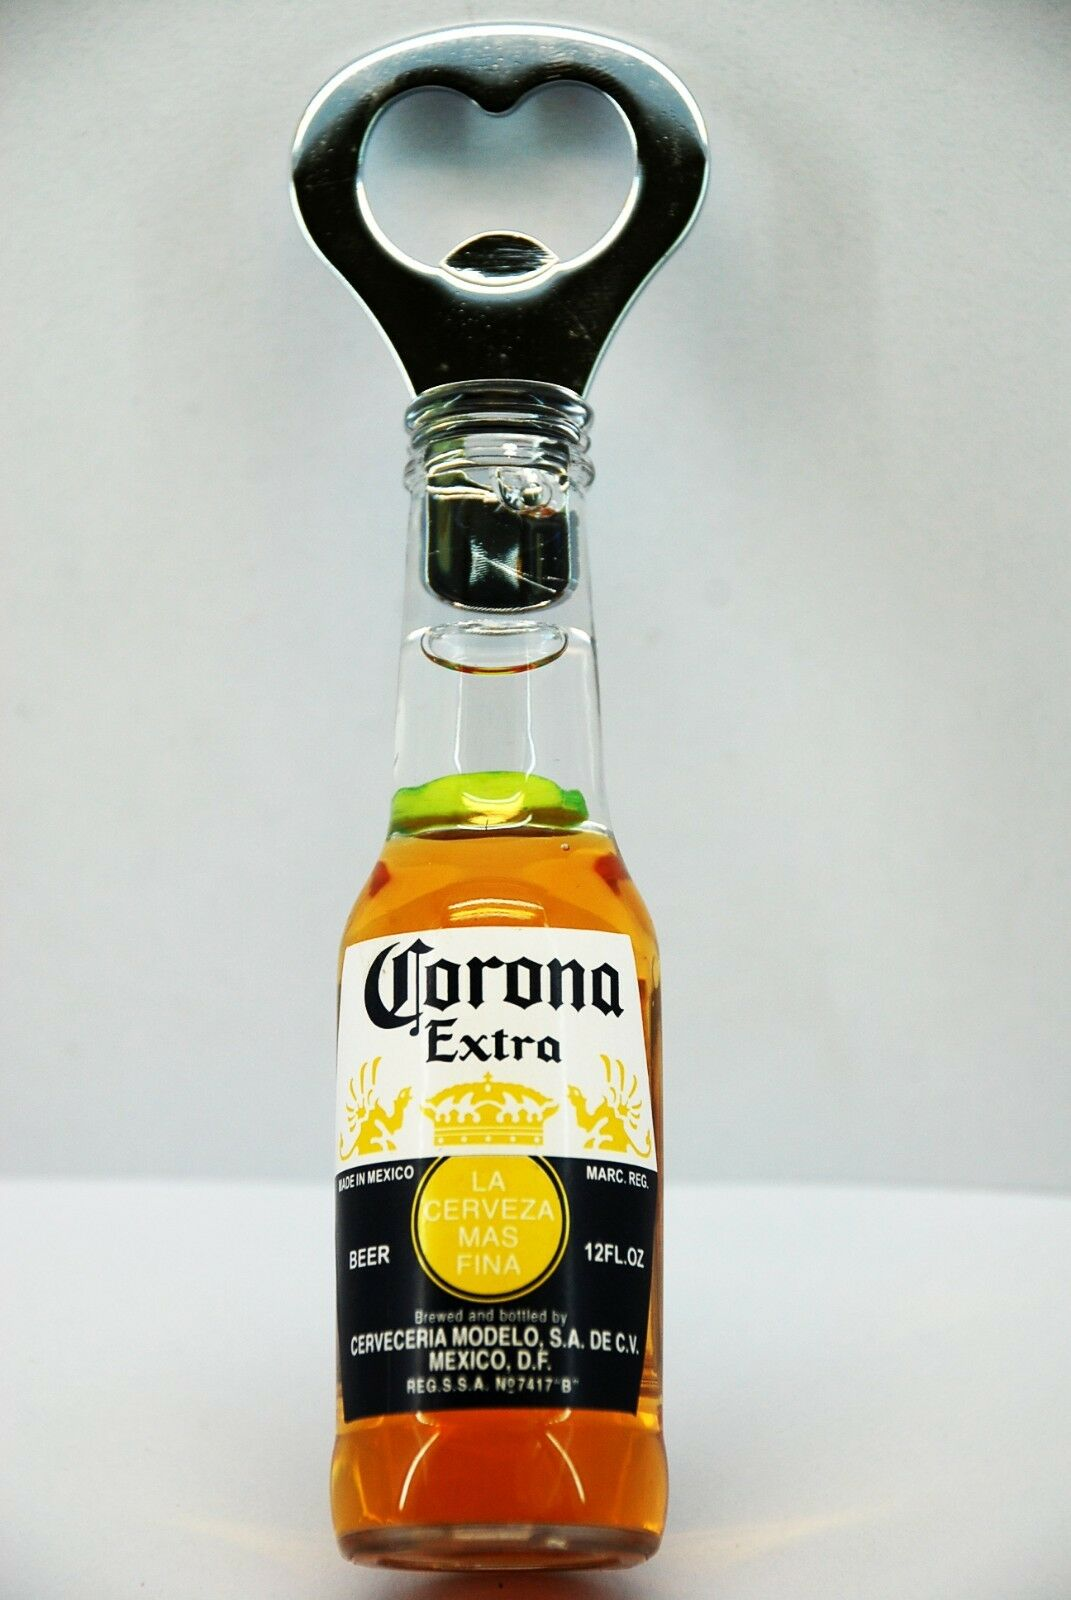 1 Pack Cactus Booluee Refrigerator Magnet Silicone Metal Bottle Opener for Beer Coke Bartender Kitchen Barware Metal Novelty Cute Fun Shape